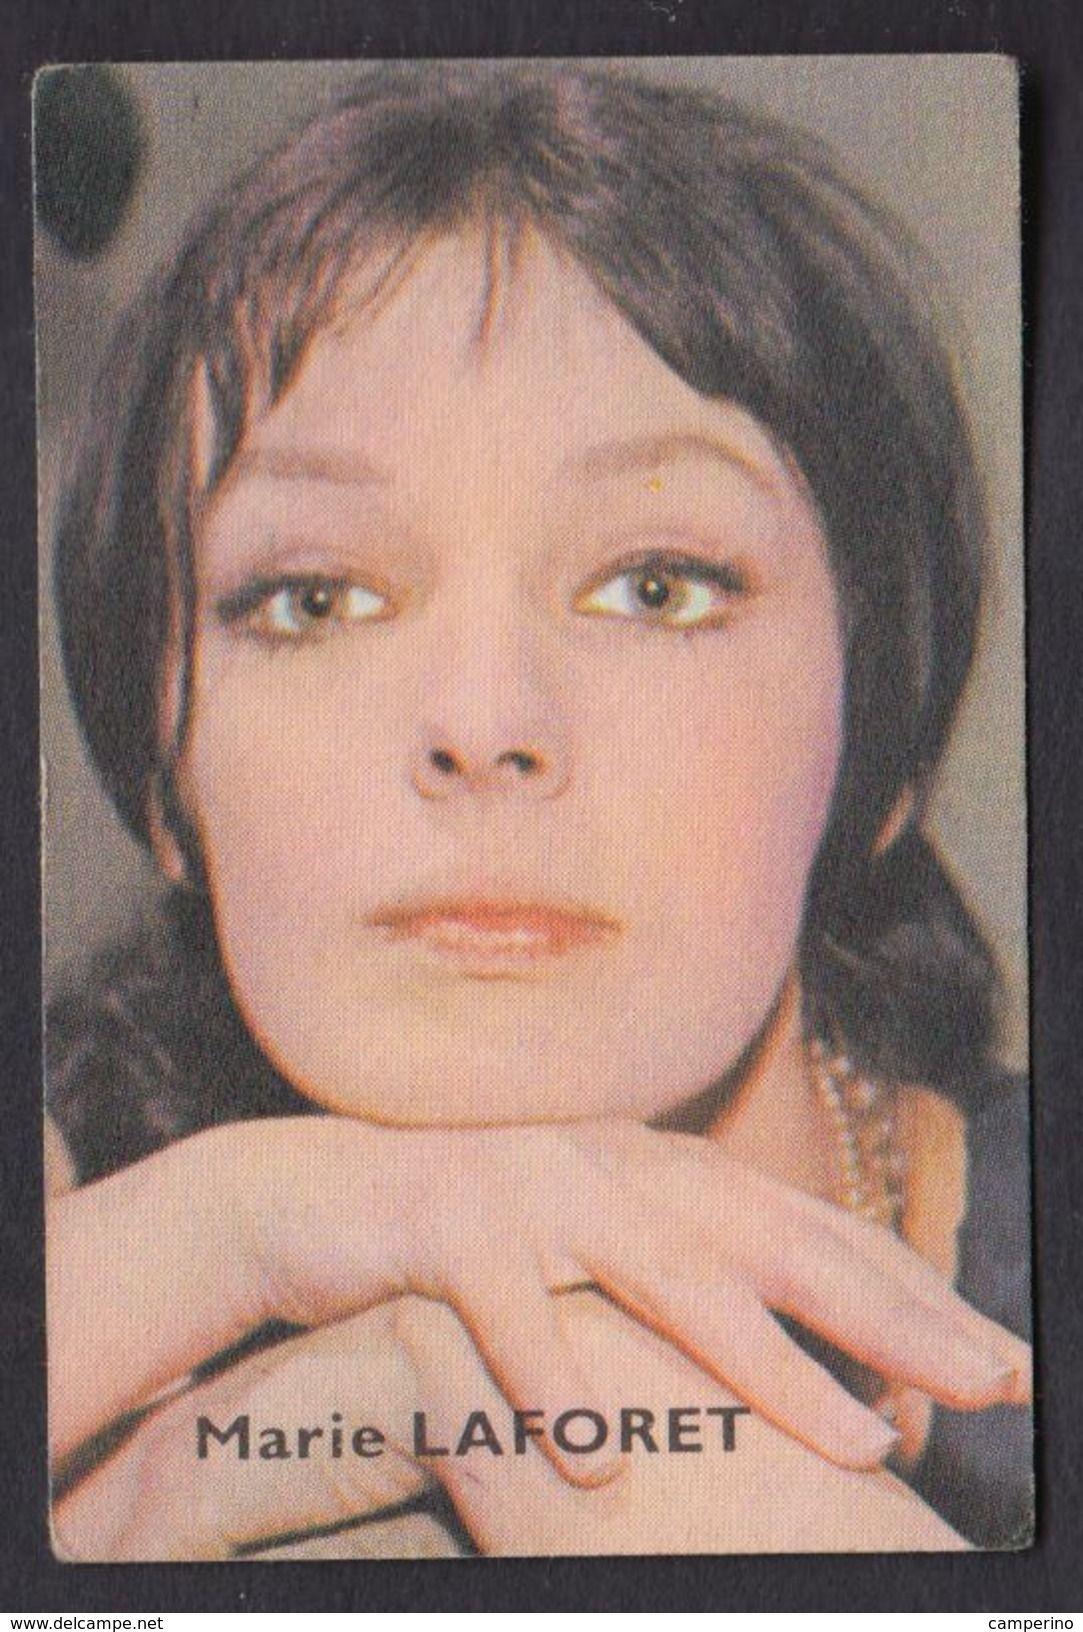 Marie Laforet Chromos Image Chocolat Victoria Vedette